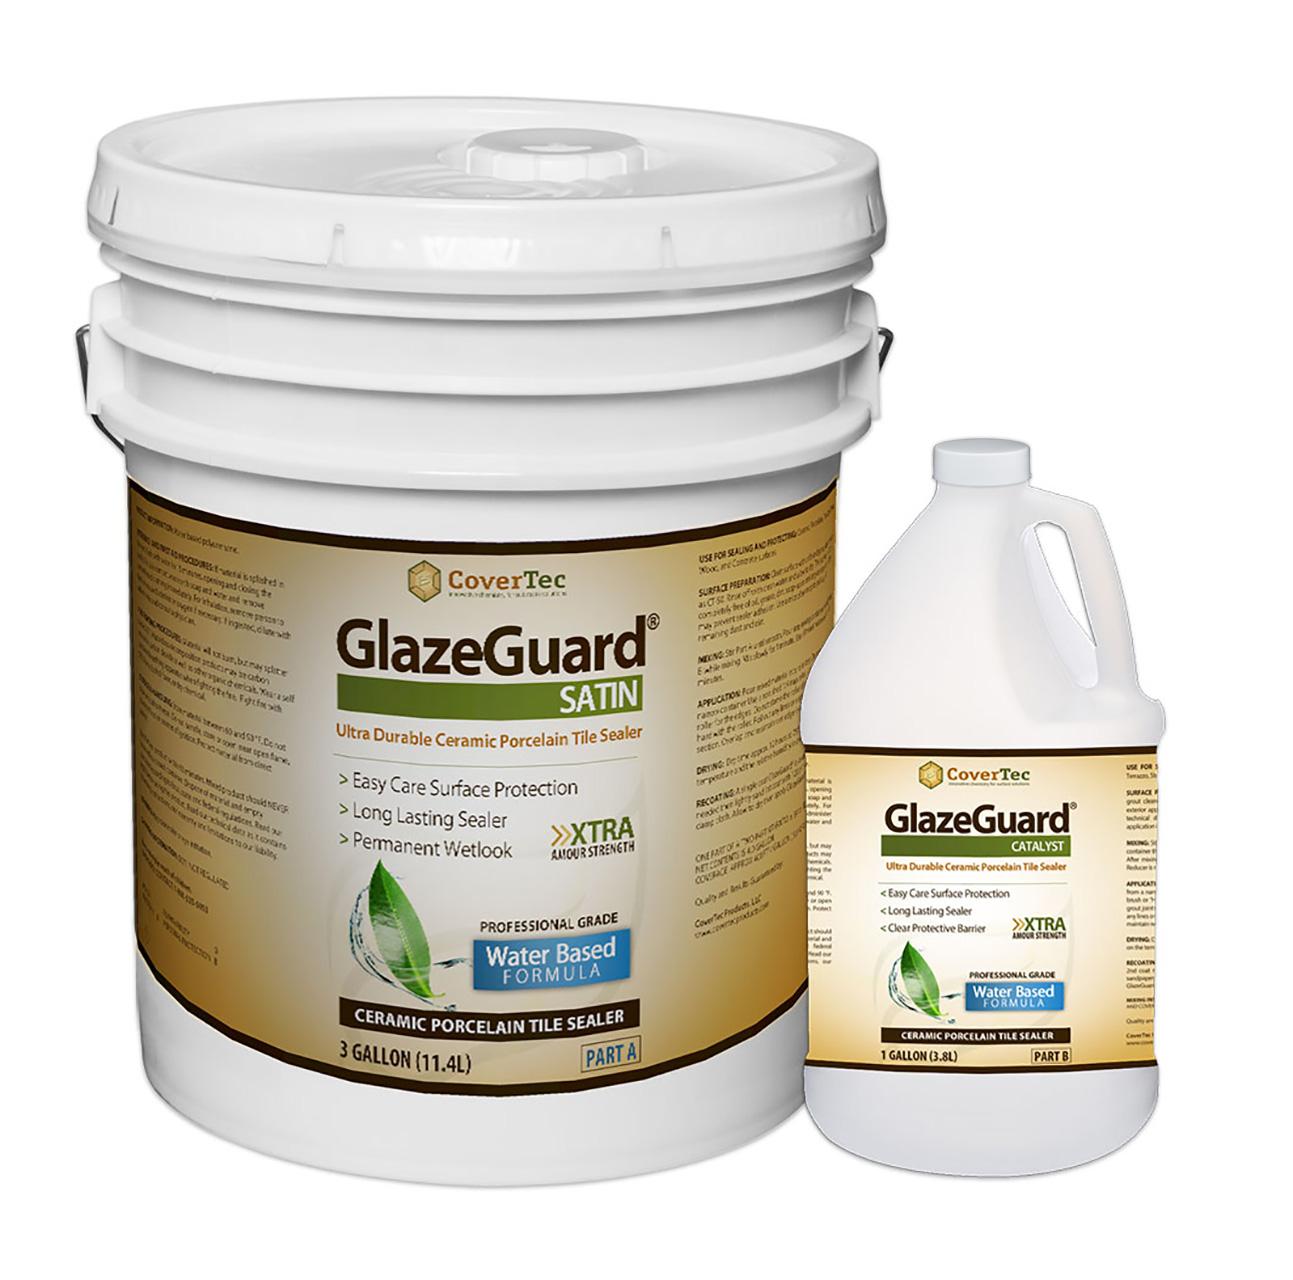 Glazeguard Satin Ceramic Porcelain Tile Sealer Satin Finish